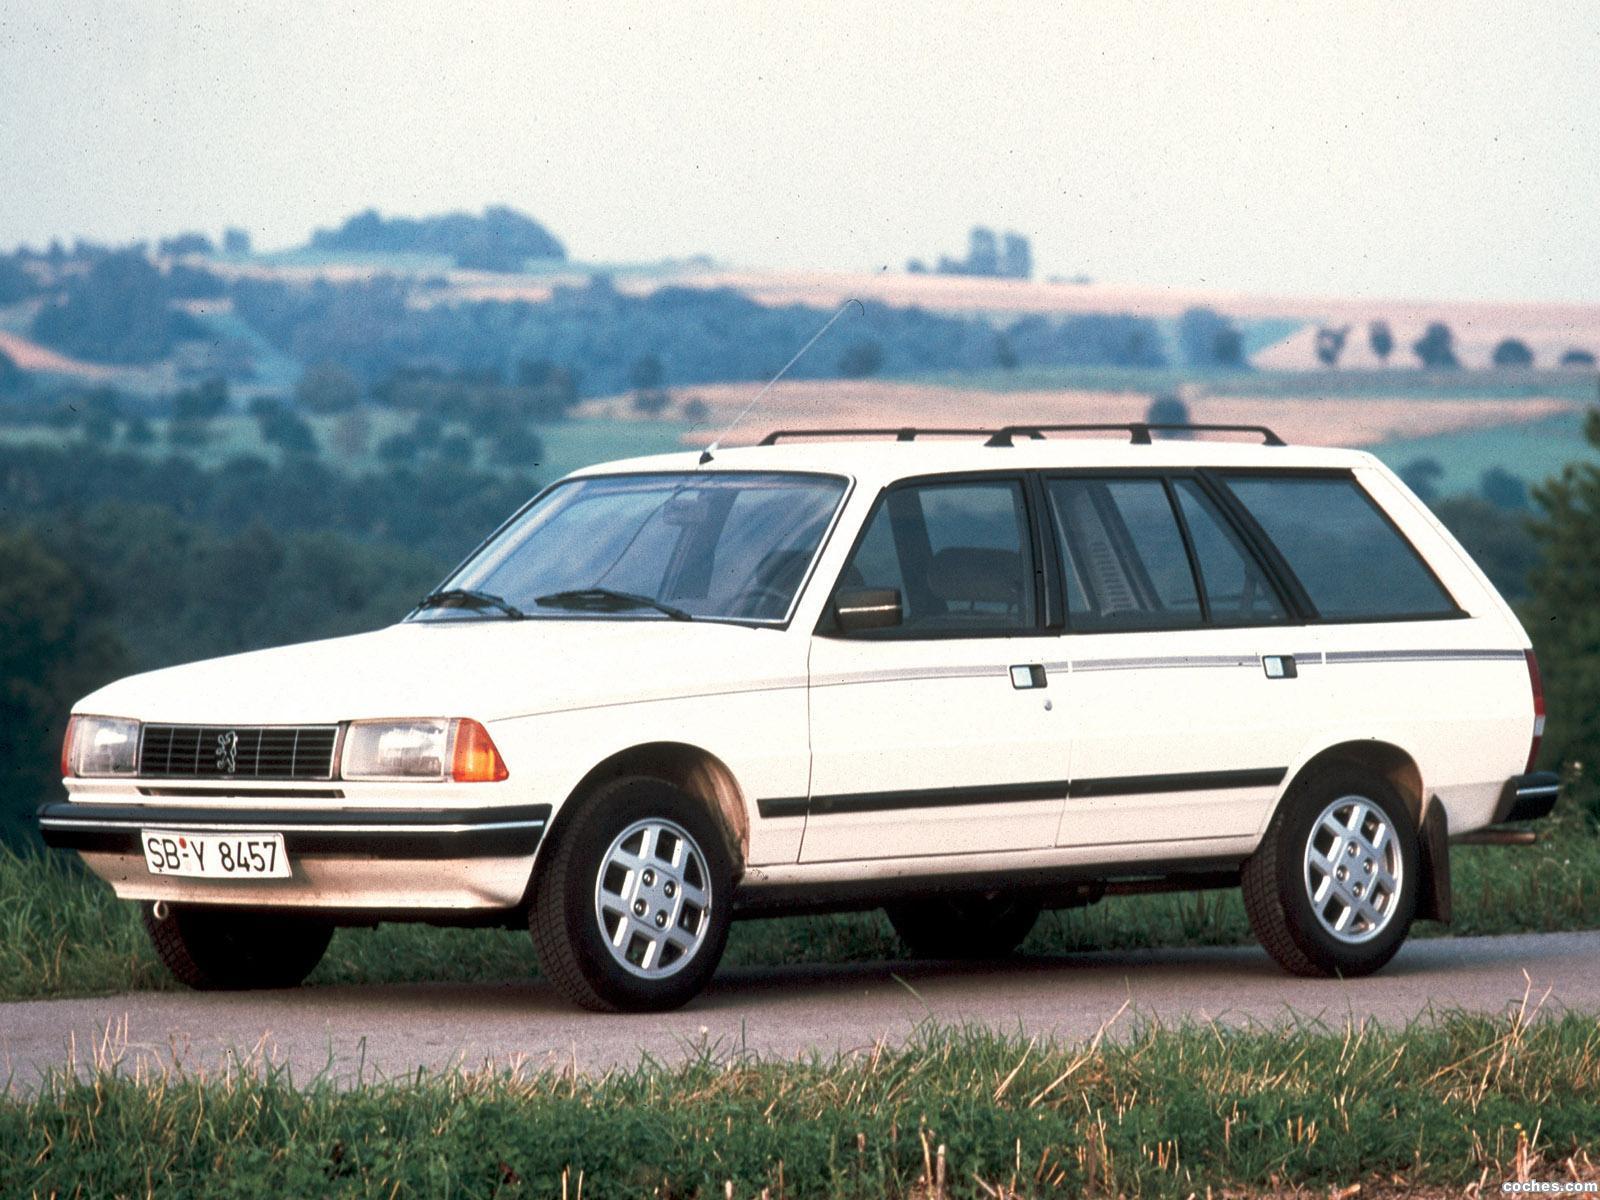 Foto 0 de Peugeot 305 Break GTX 1983